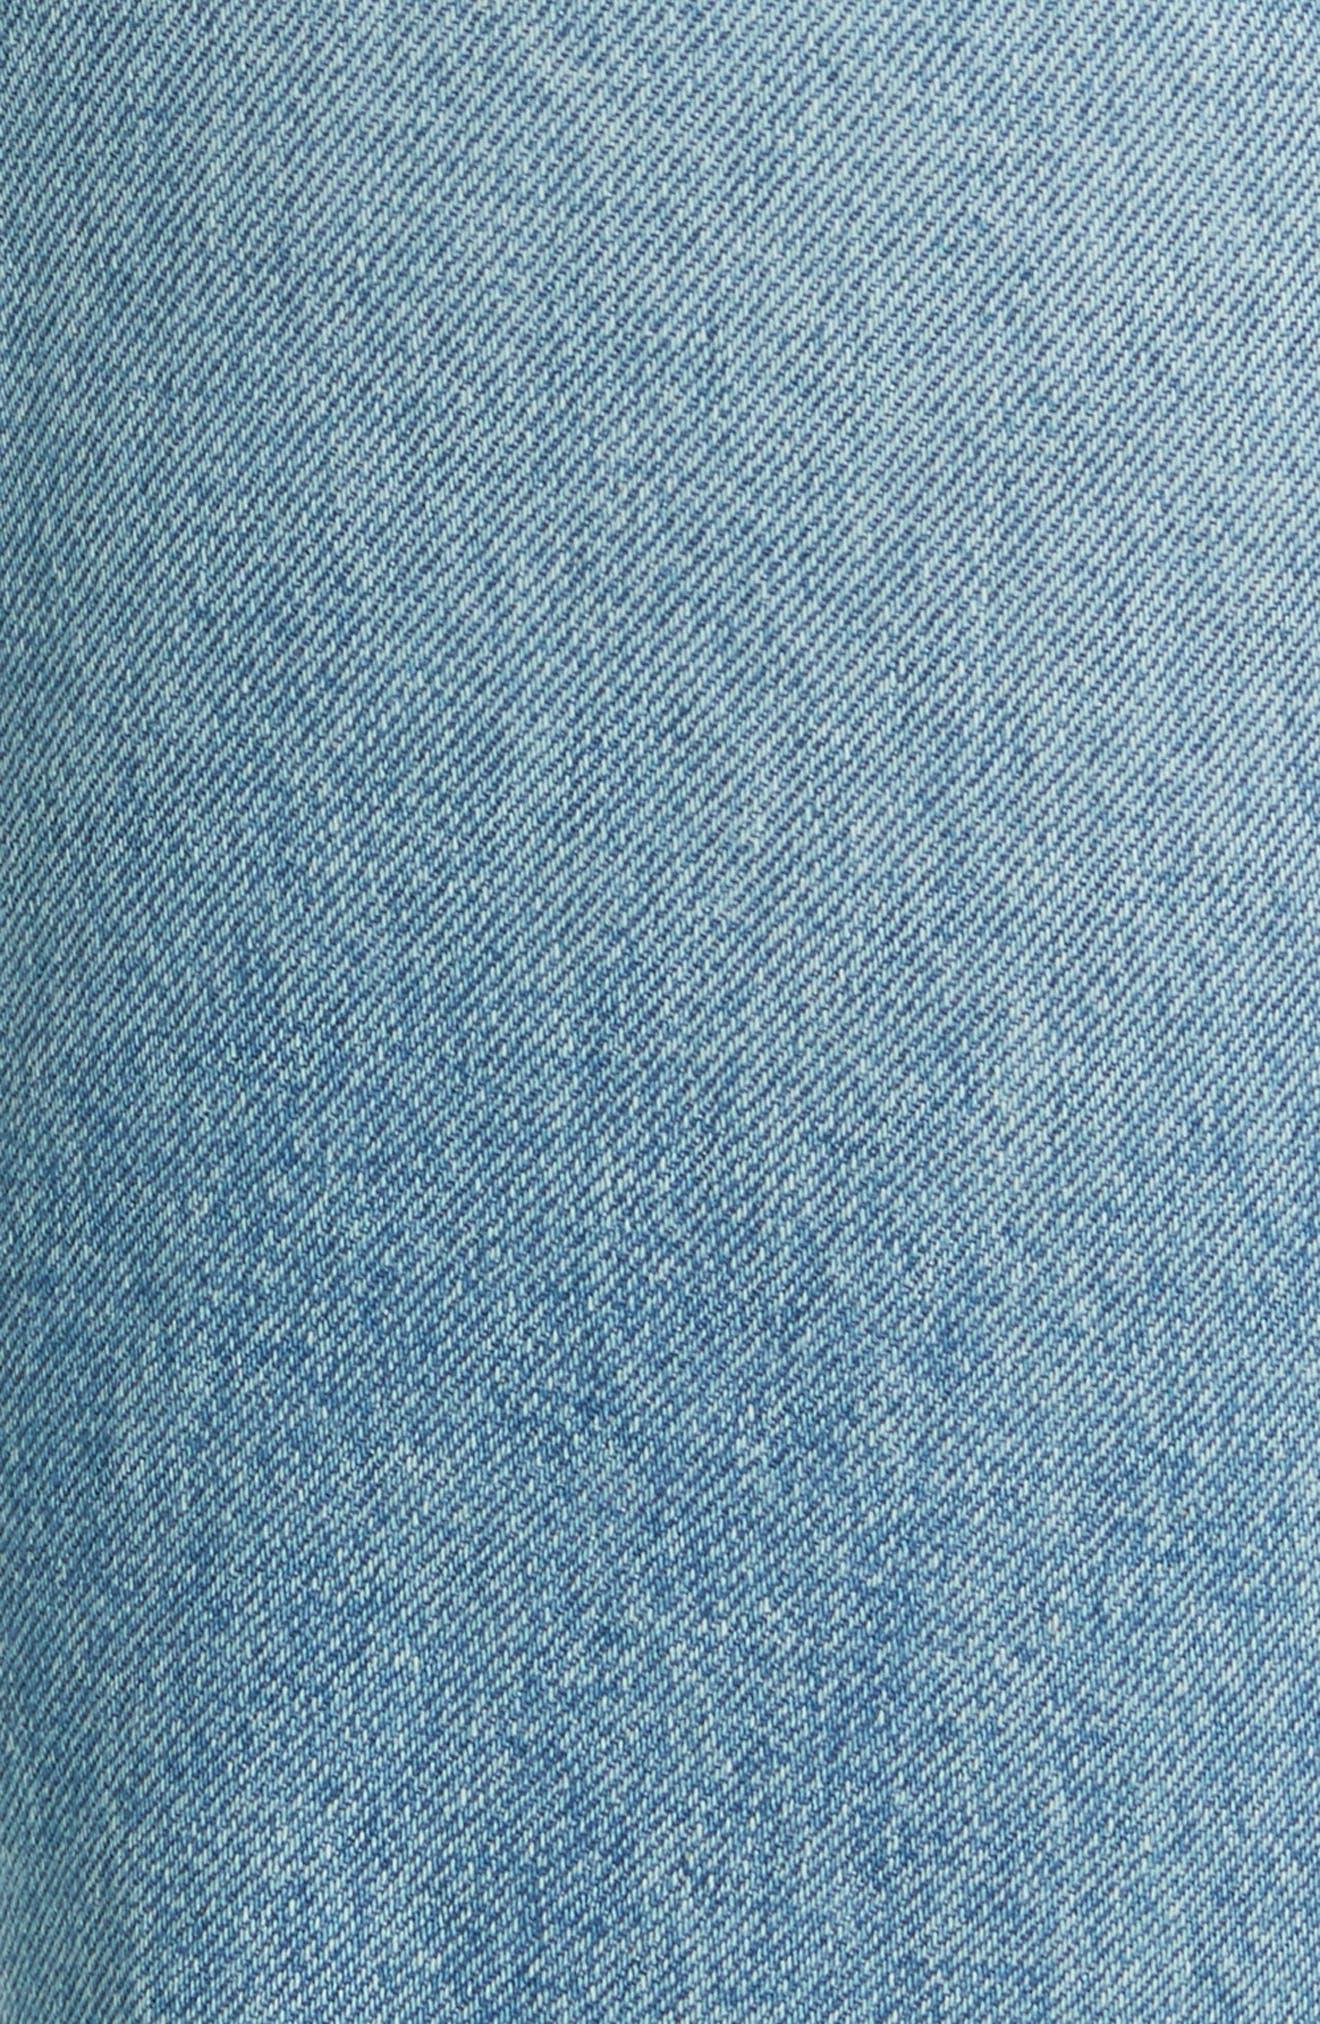 Alternate Image 5  - GRLFRND Maran Wide Leg Crop Jeans (Archaic)